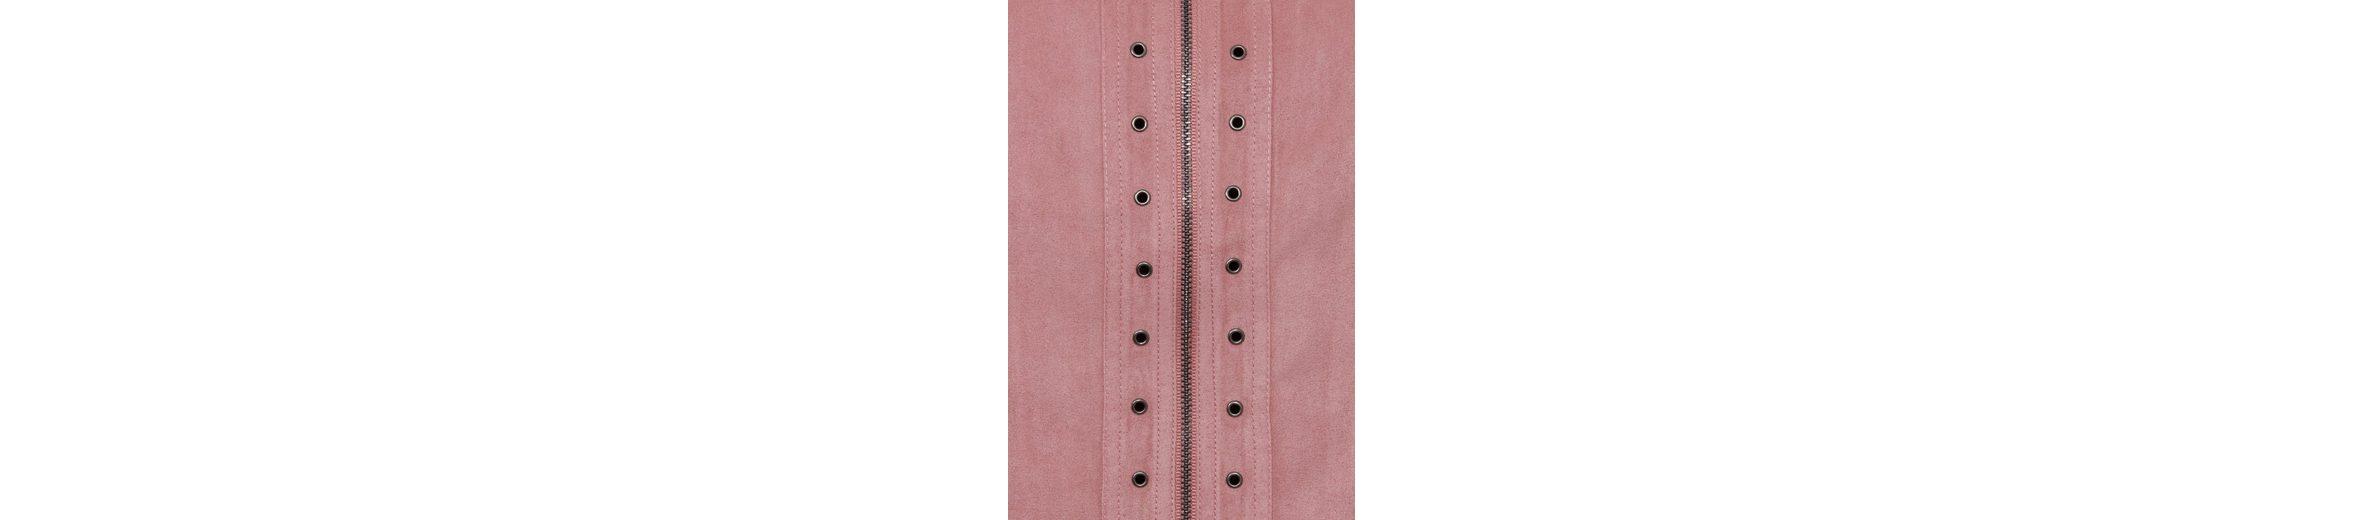 VIA APPIA DUE Coole Jacke mit Nieten-Detail Neueste Online uQd5gS2Ri3